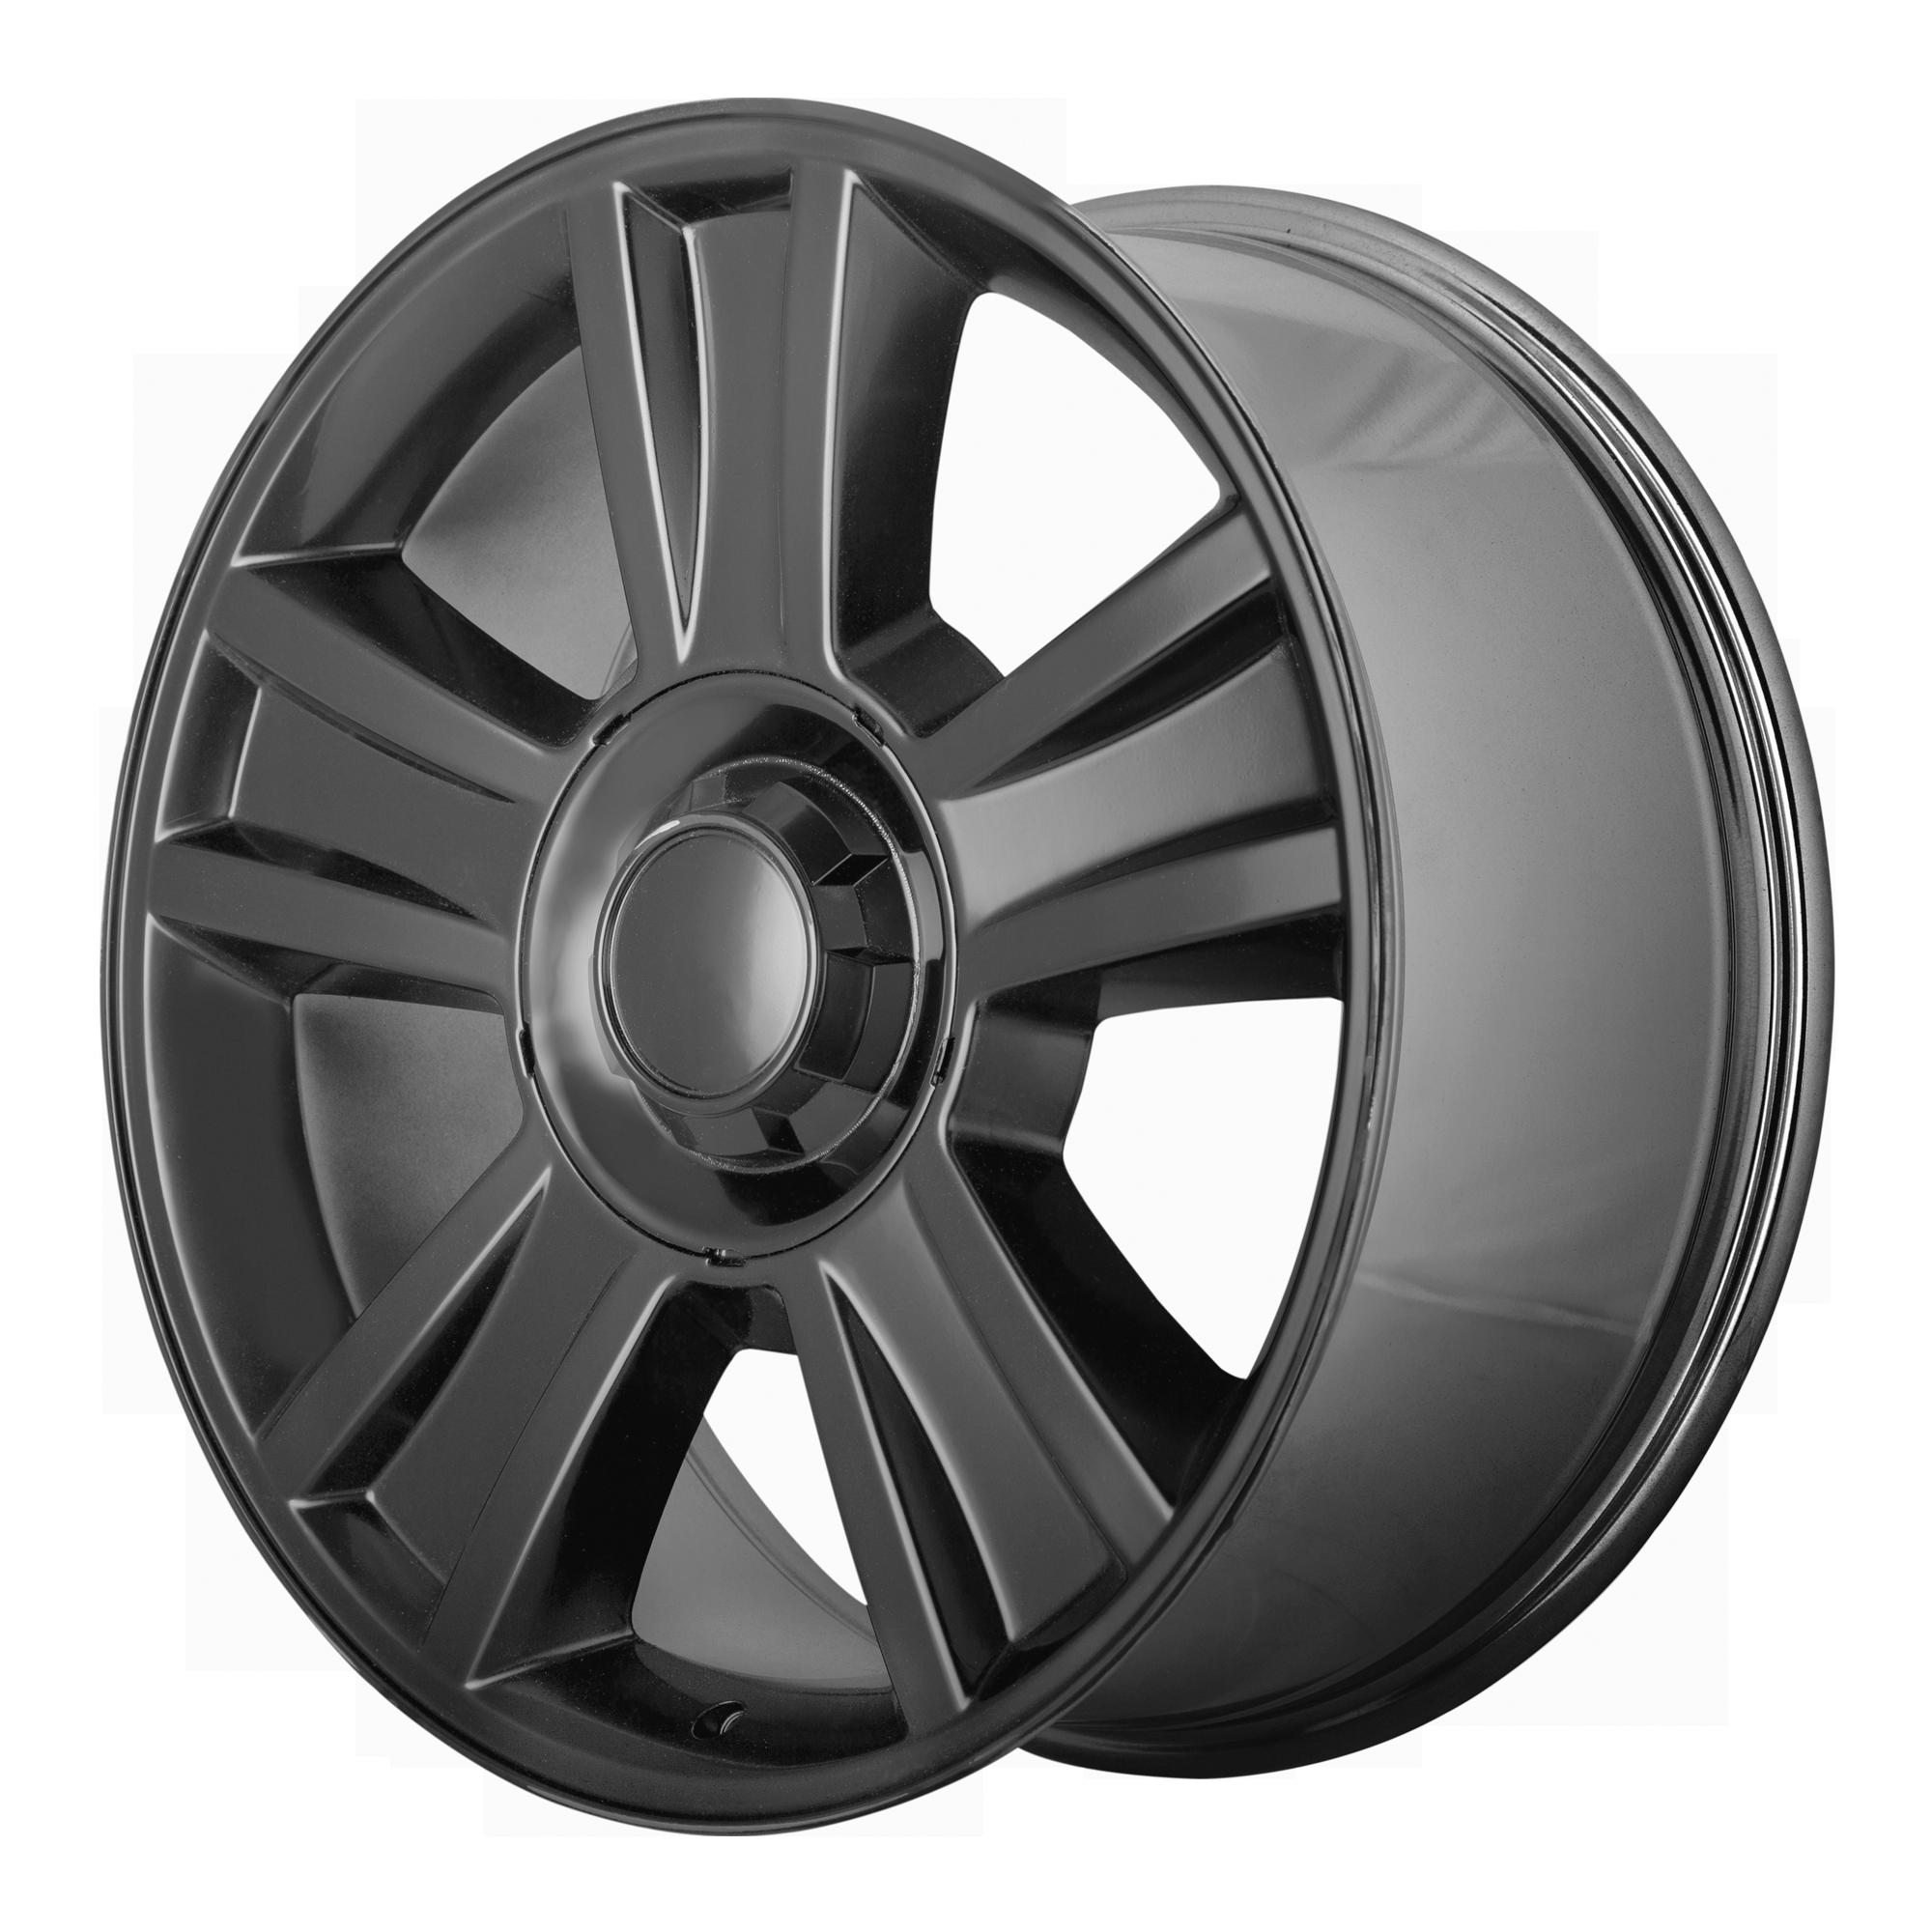 OE Creations Replica Wheels OE Creations PR143 Gloss Black